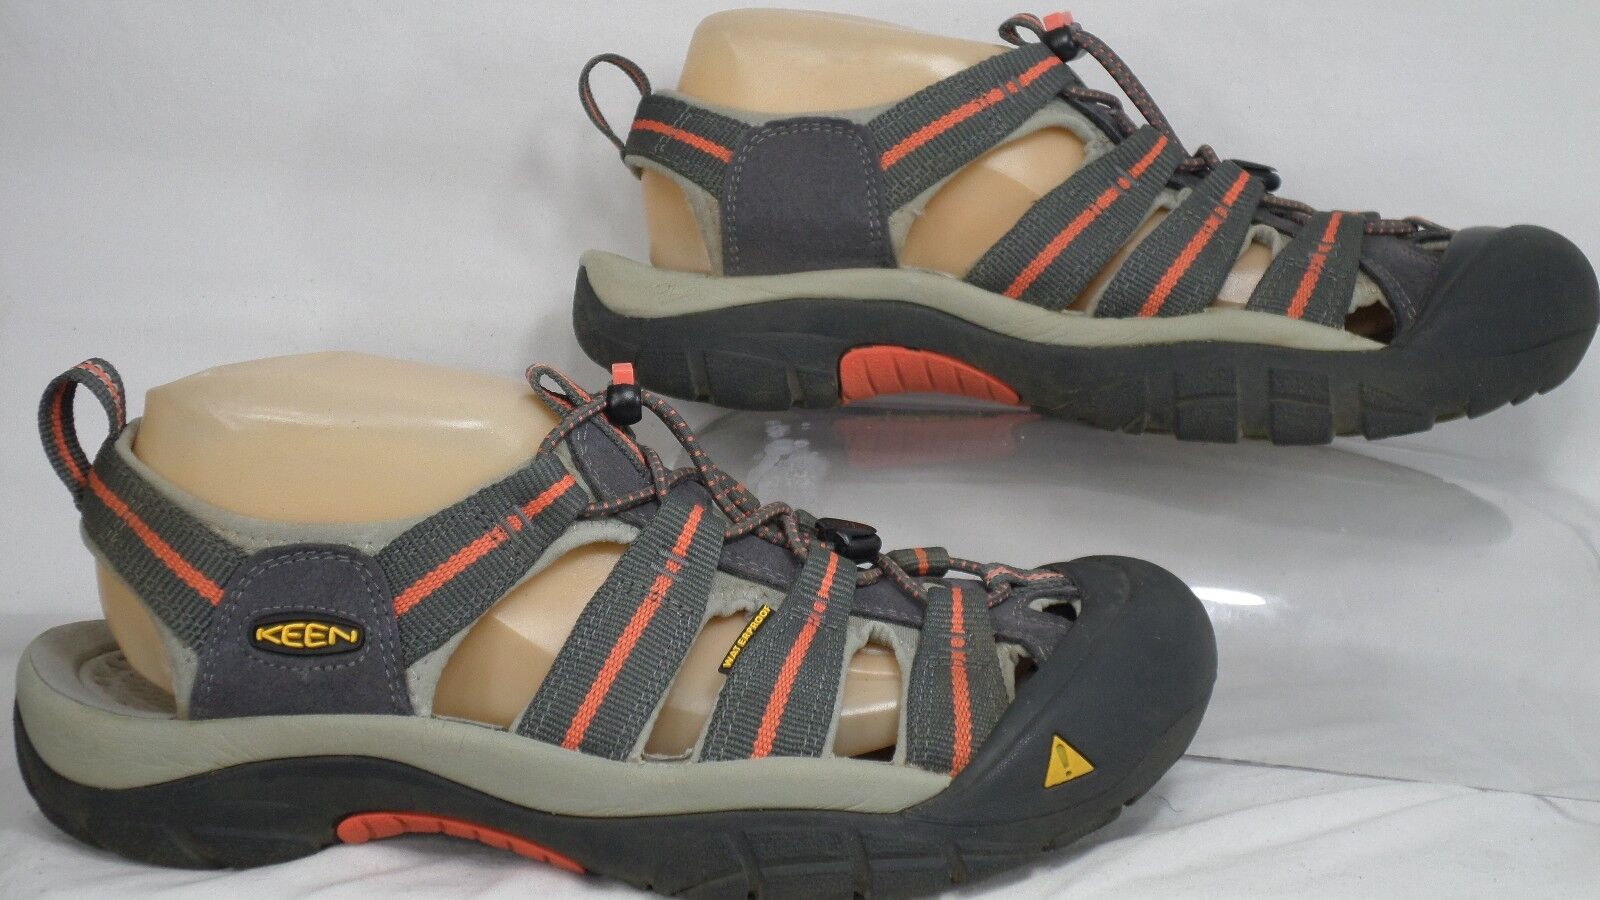 KEEN 1010955 'Newport H2' Magnet Hot Coral Closed-Toe Sandal Women Size 9.5 M